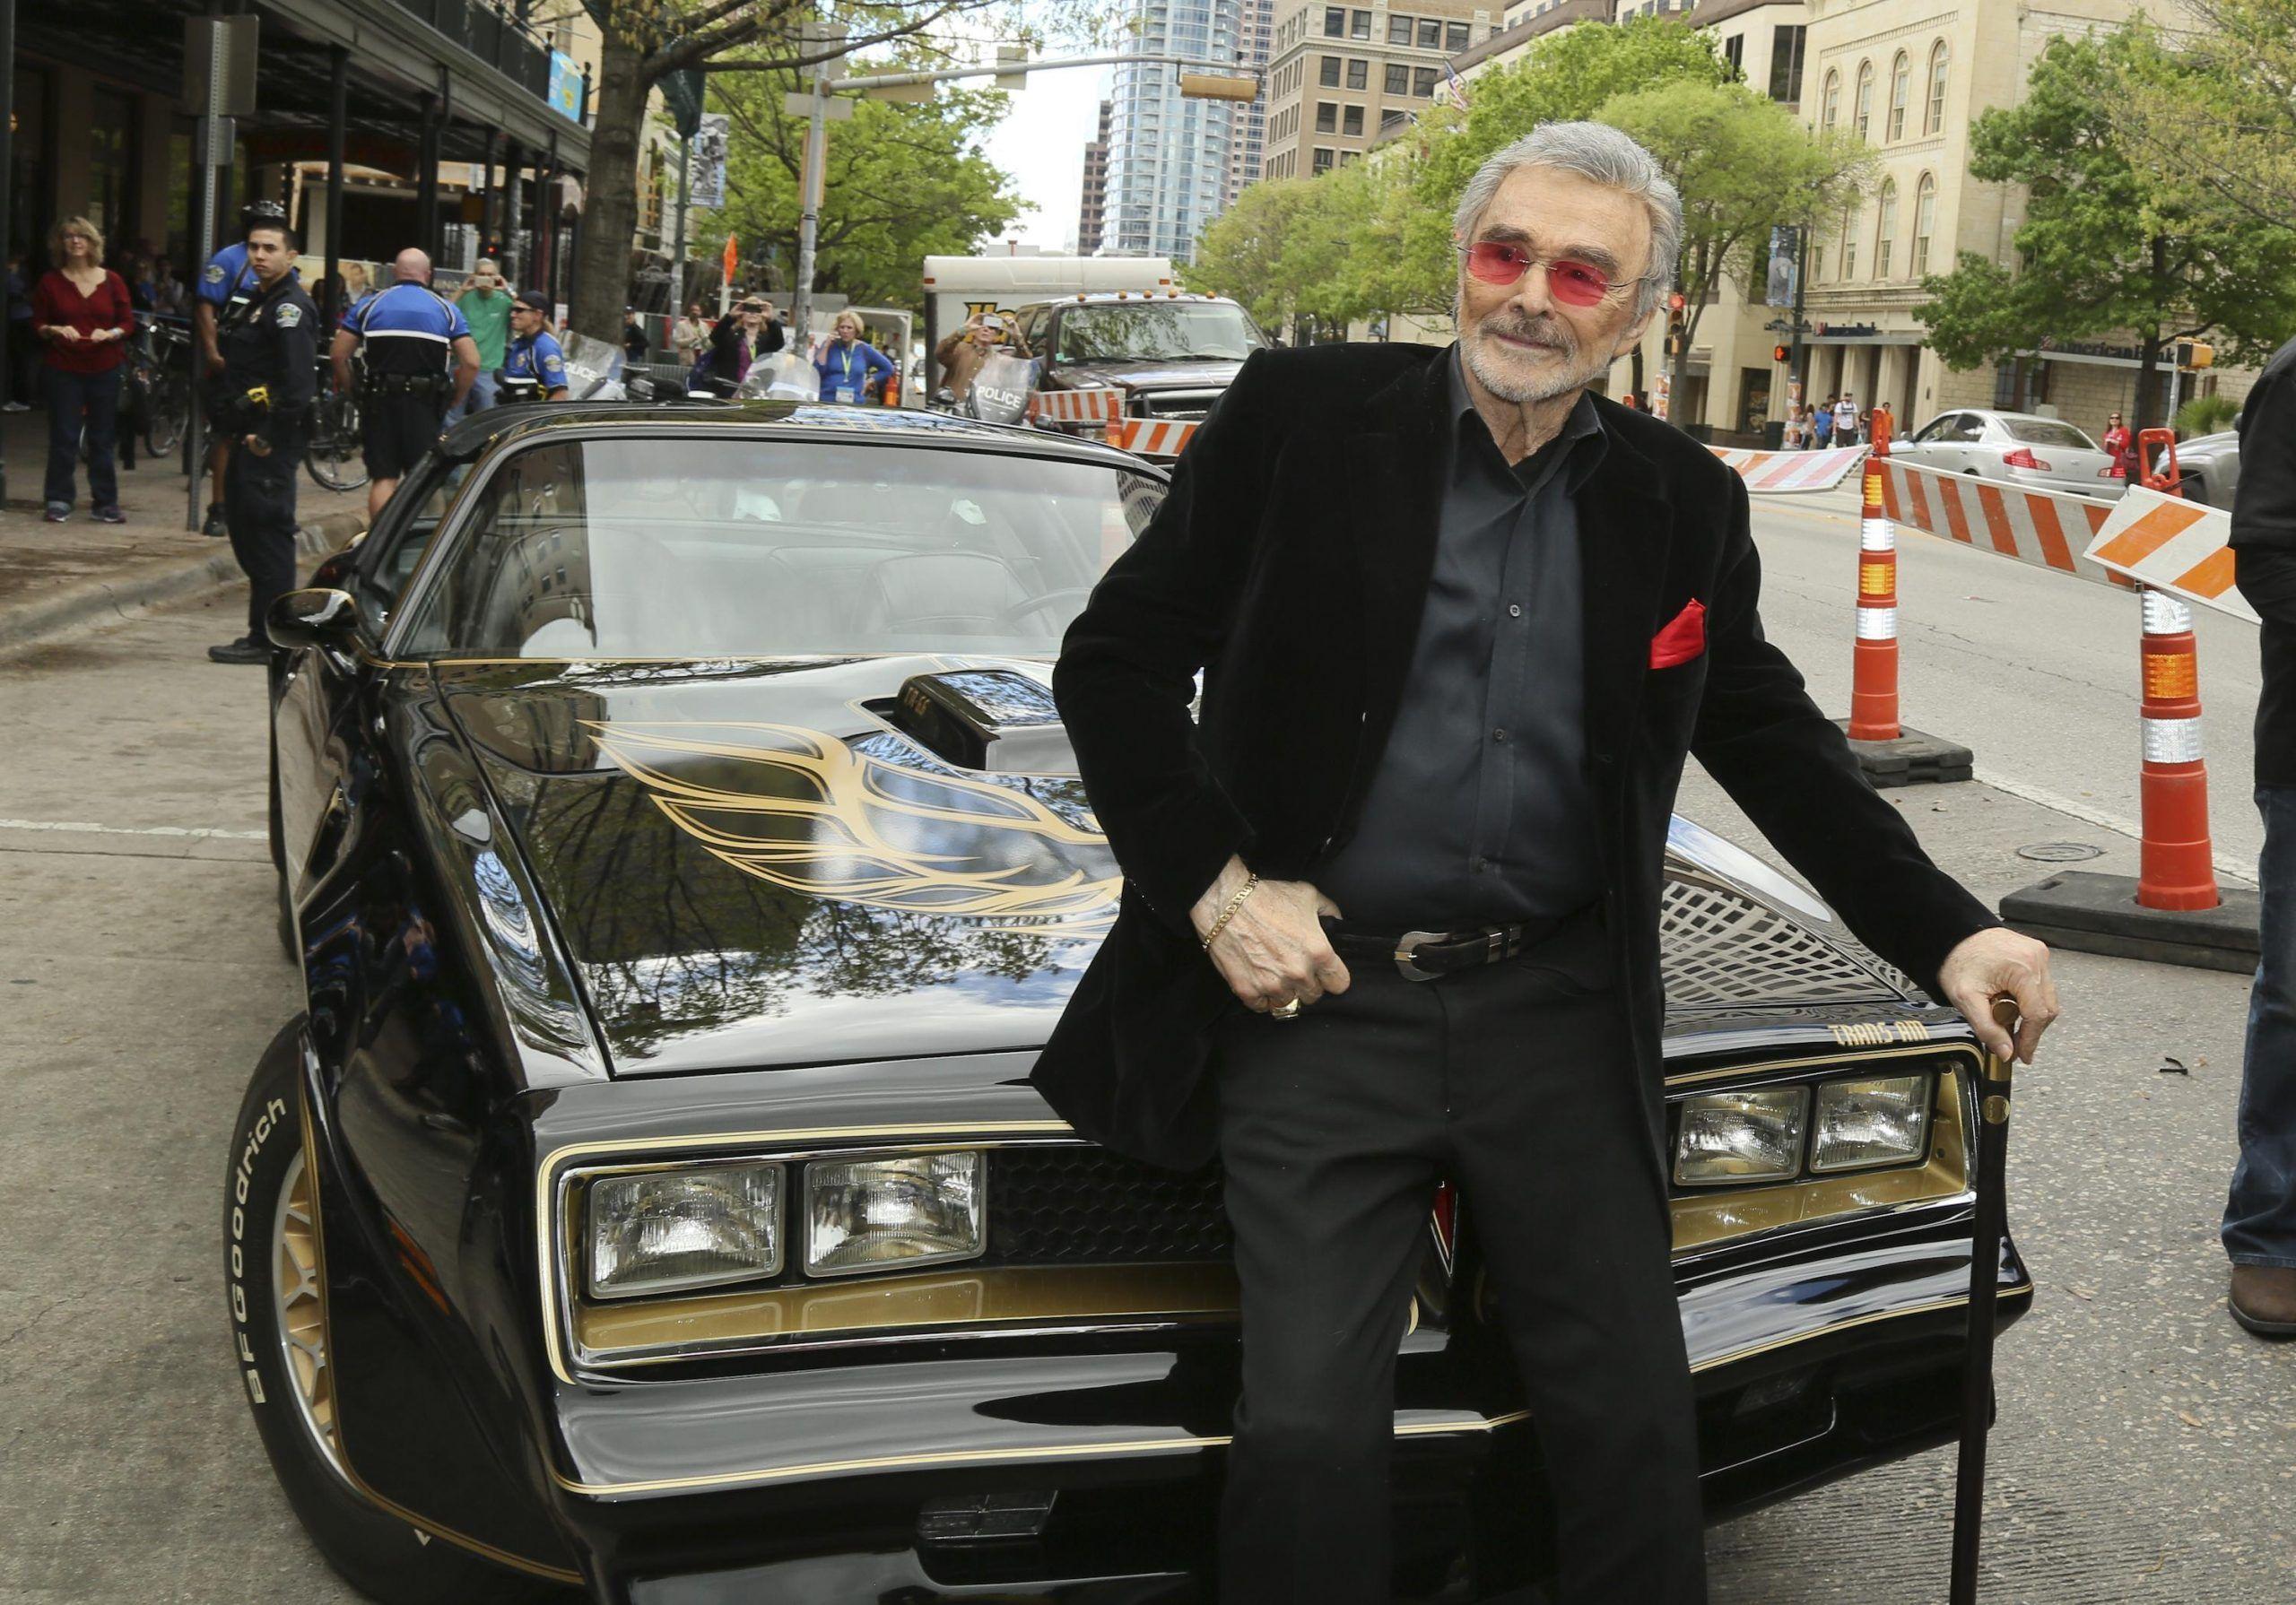 Morto Burt Reynolds, attore star di 'Boogie Nights': aveva 82 anni